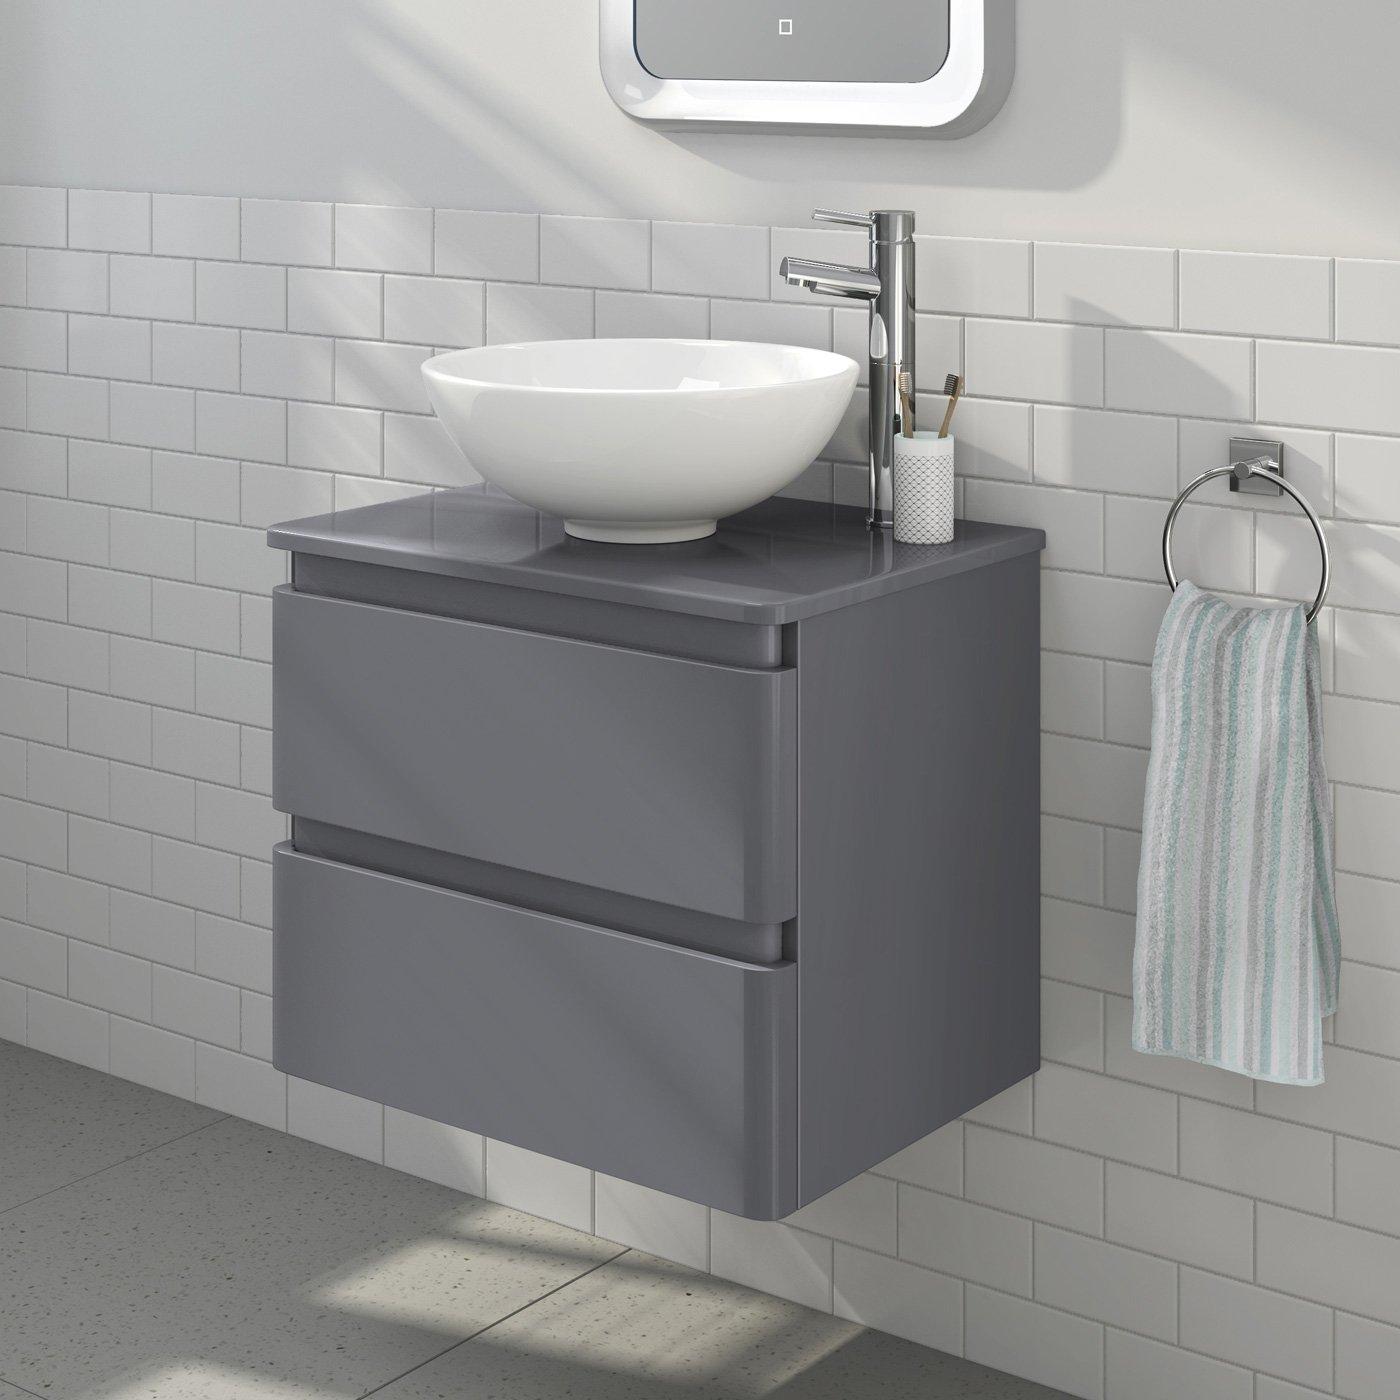 Modern Bathroom Furniture Countertop Basin Storage Unit Wall Hung